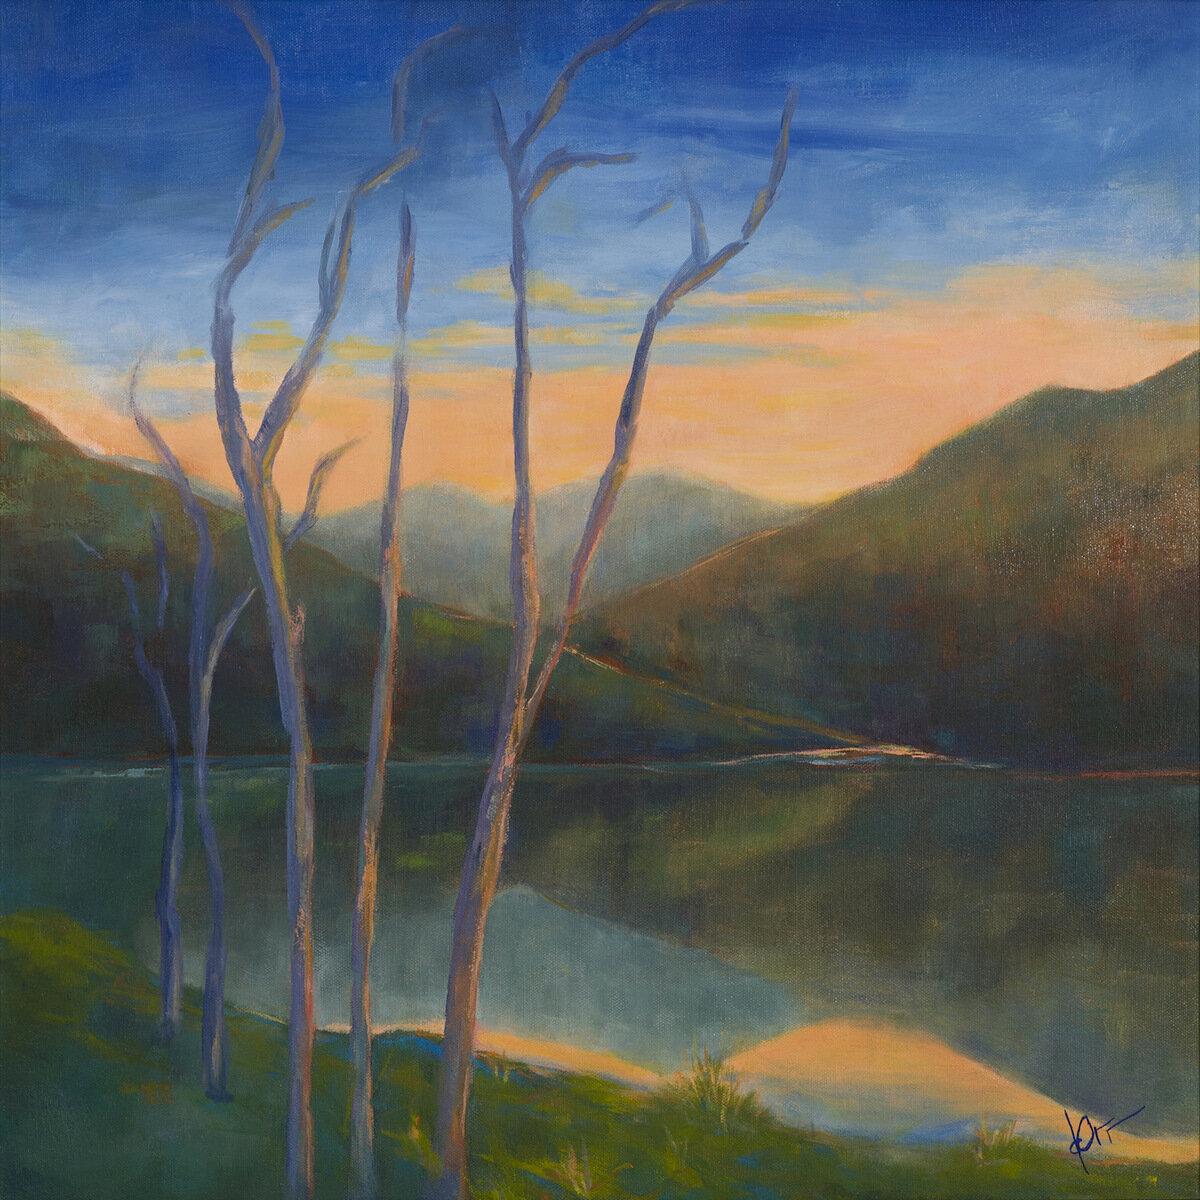 Darcy Orr, Landscape Painting, SVFAL-008.jpg